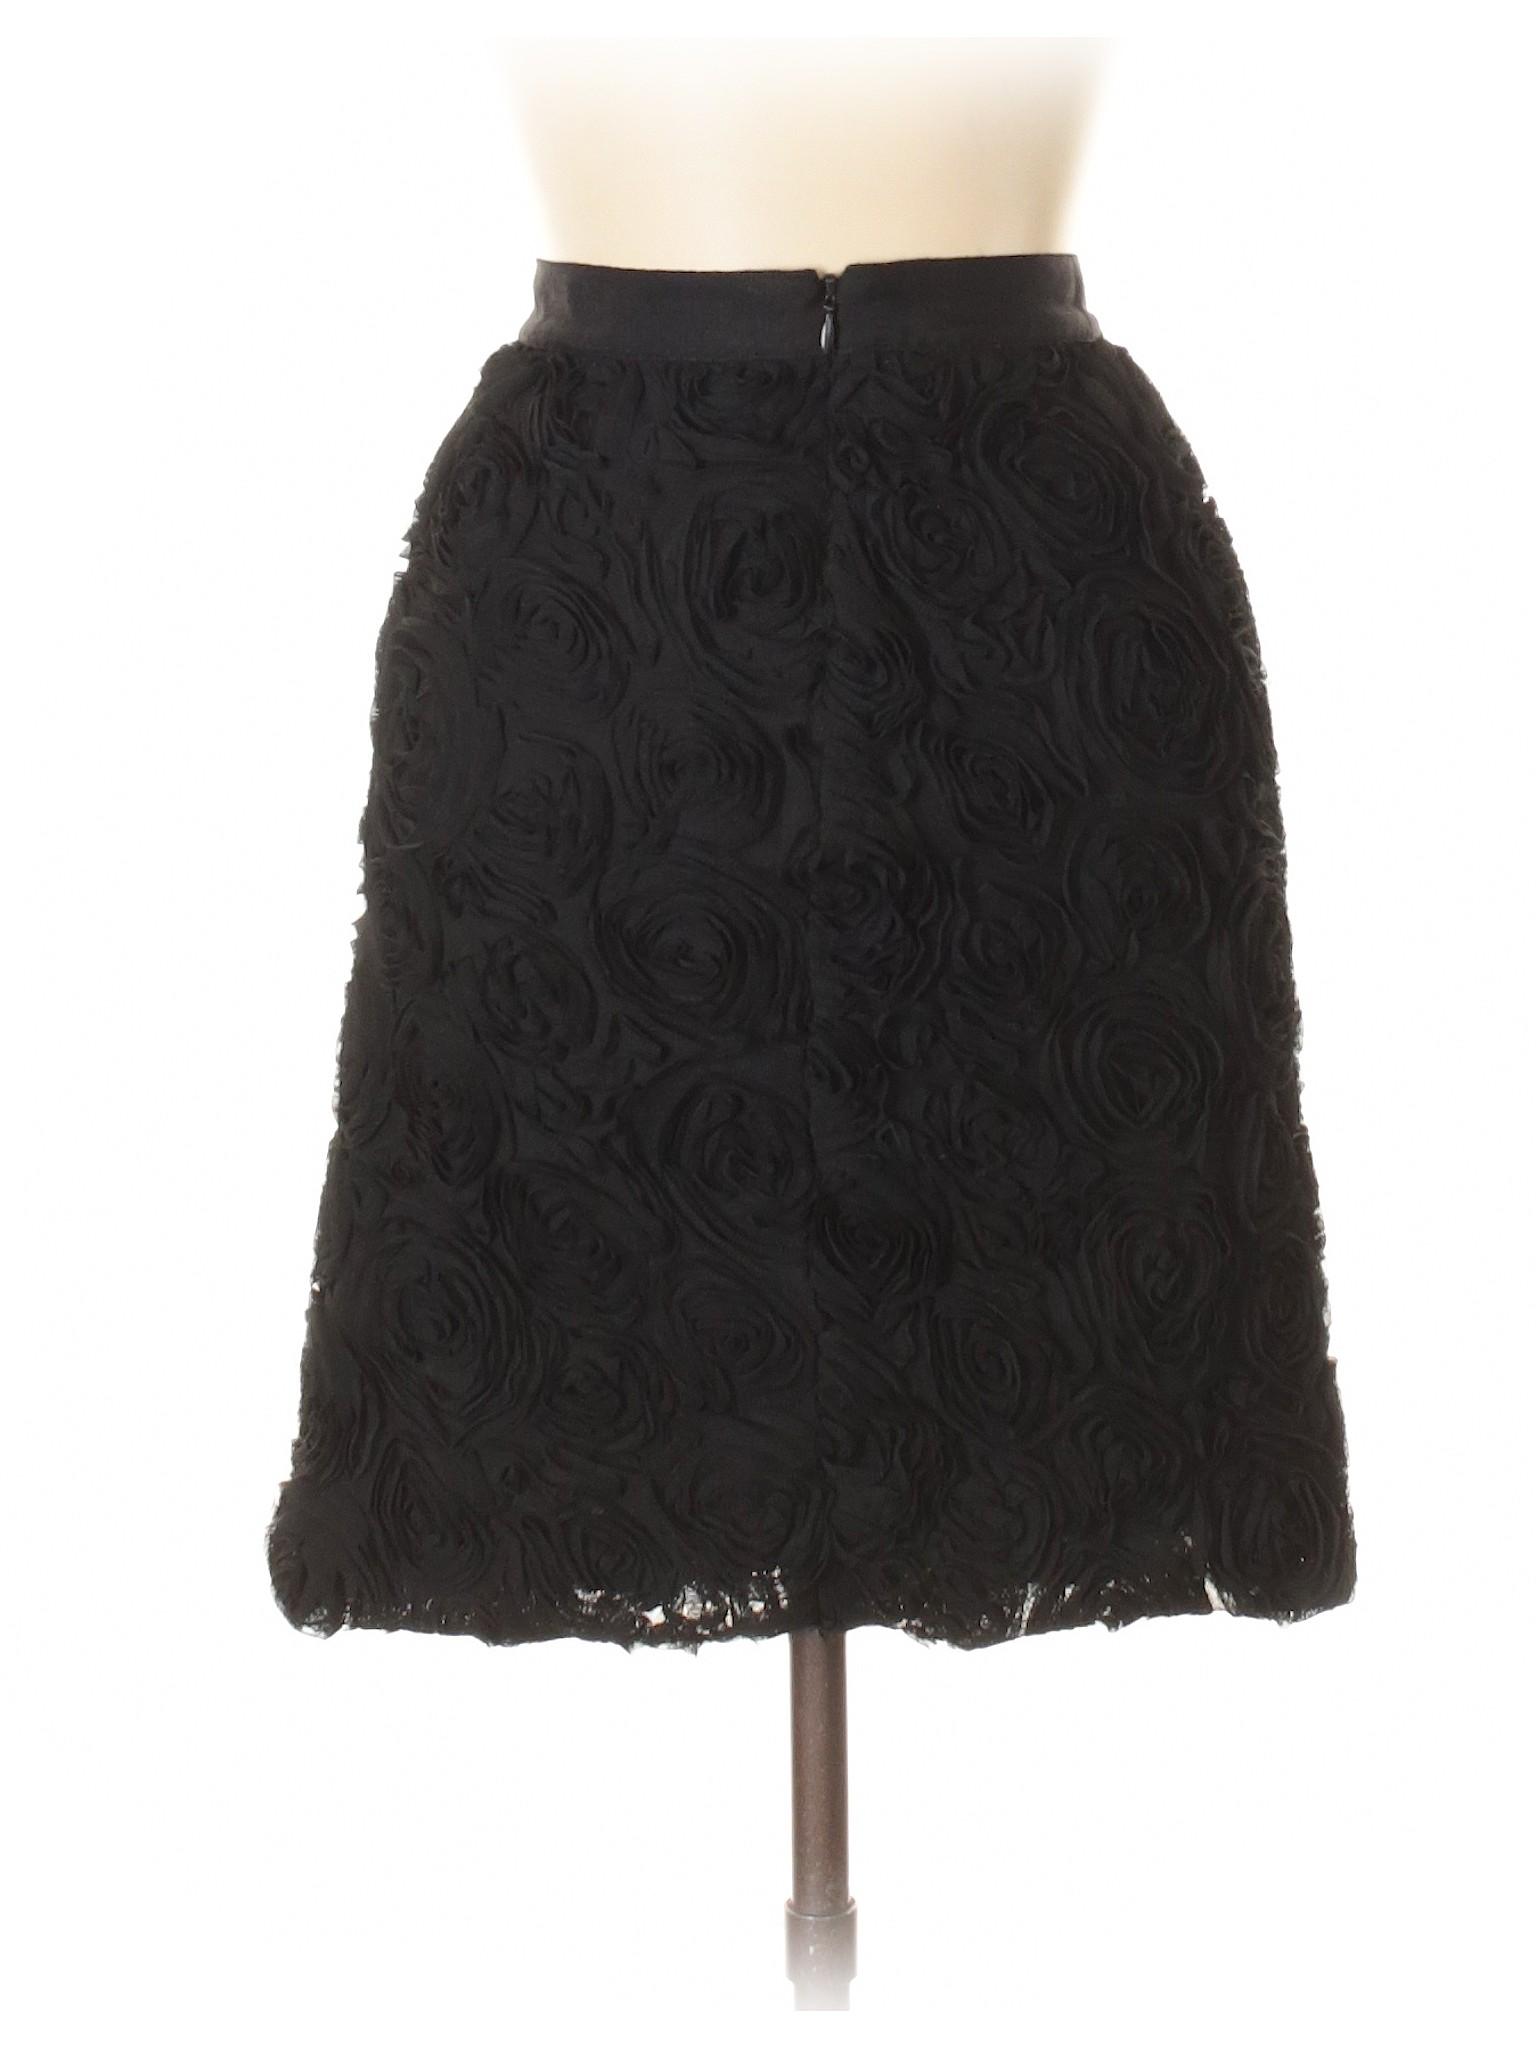 Boutique Skirt Republic Banana leisure Casual qqx70Pgw